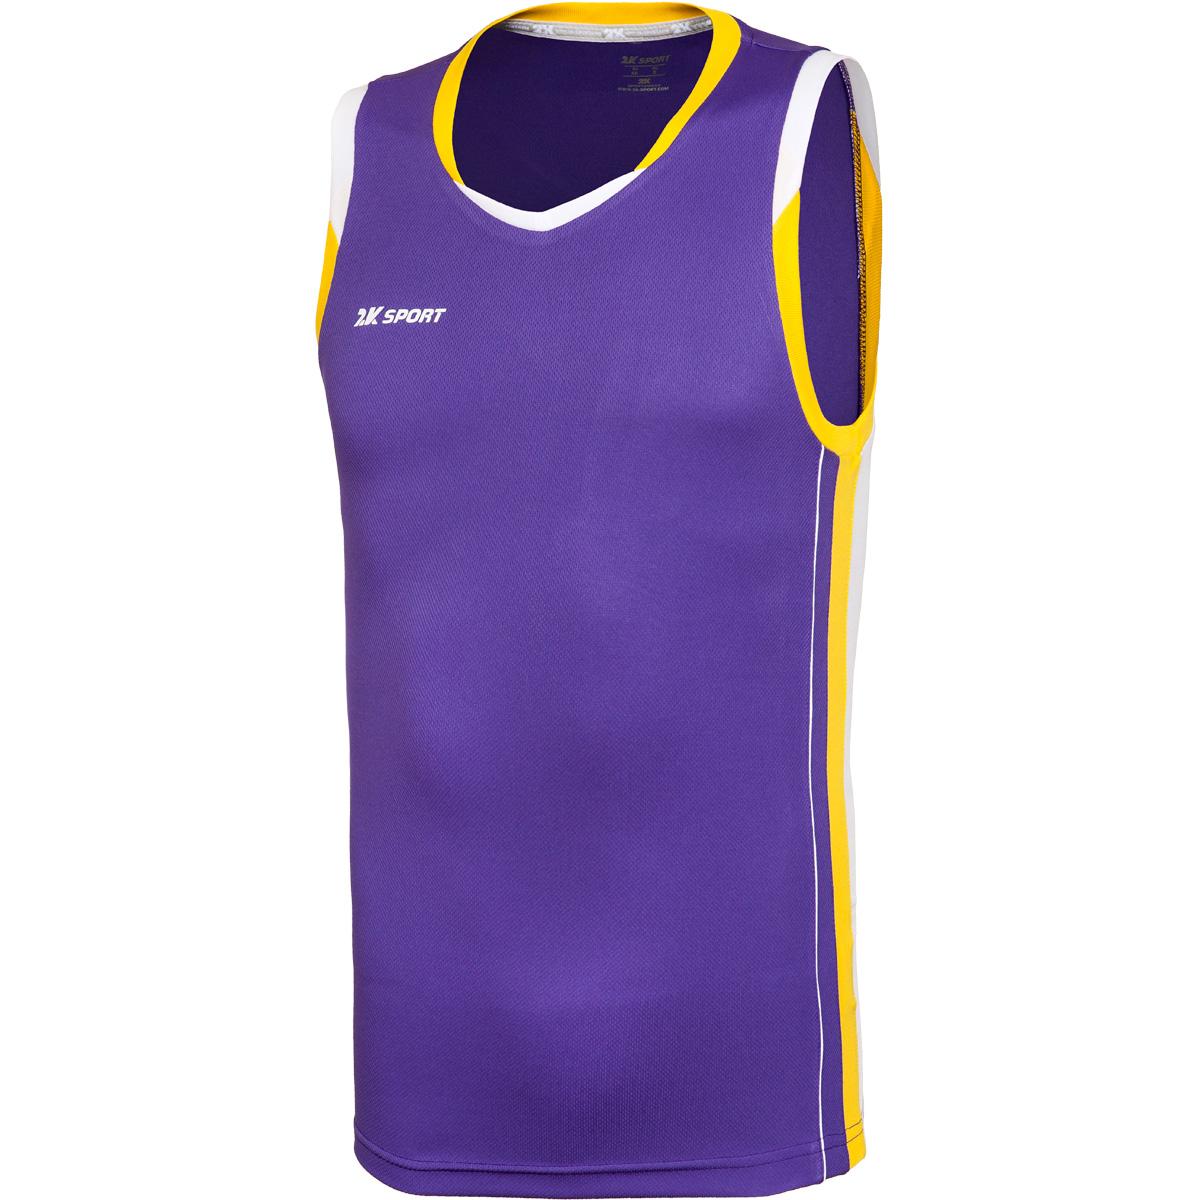 Майка баскетбольная мужская 2K Sport Advance, цвет: фиолетовый, желтый, белый. 130030. Размер XL (52) - Баскетбол